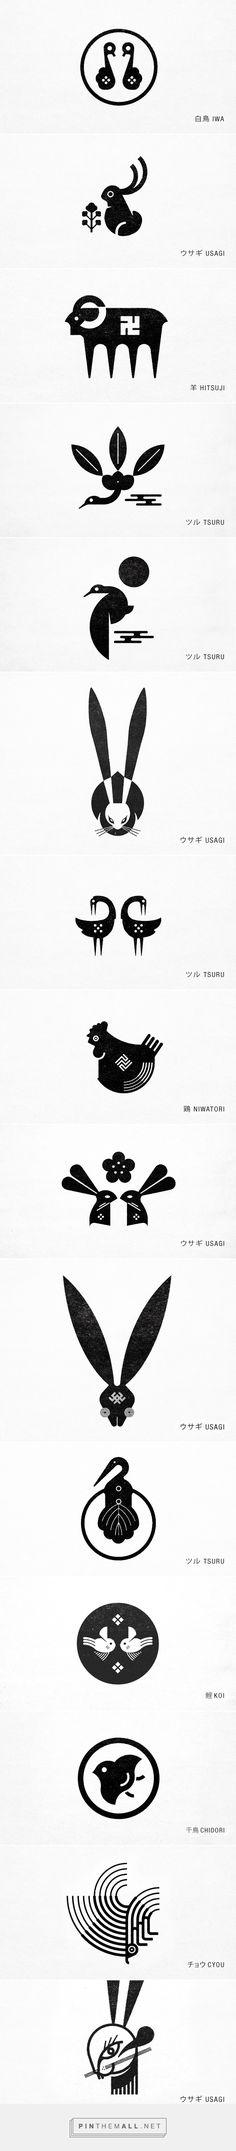 Hiroshima mon amour. on Behance - created via https://pinthemall.net